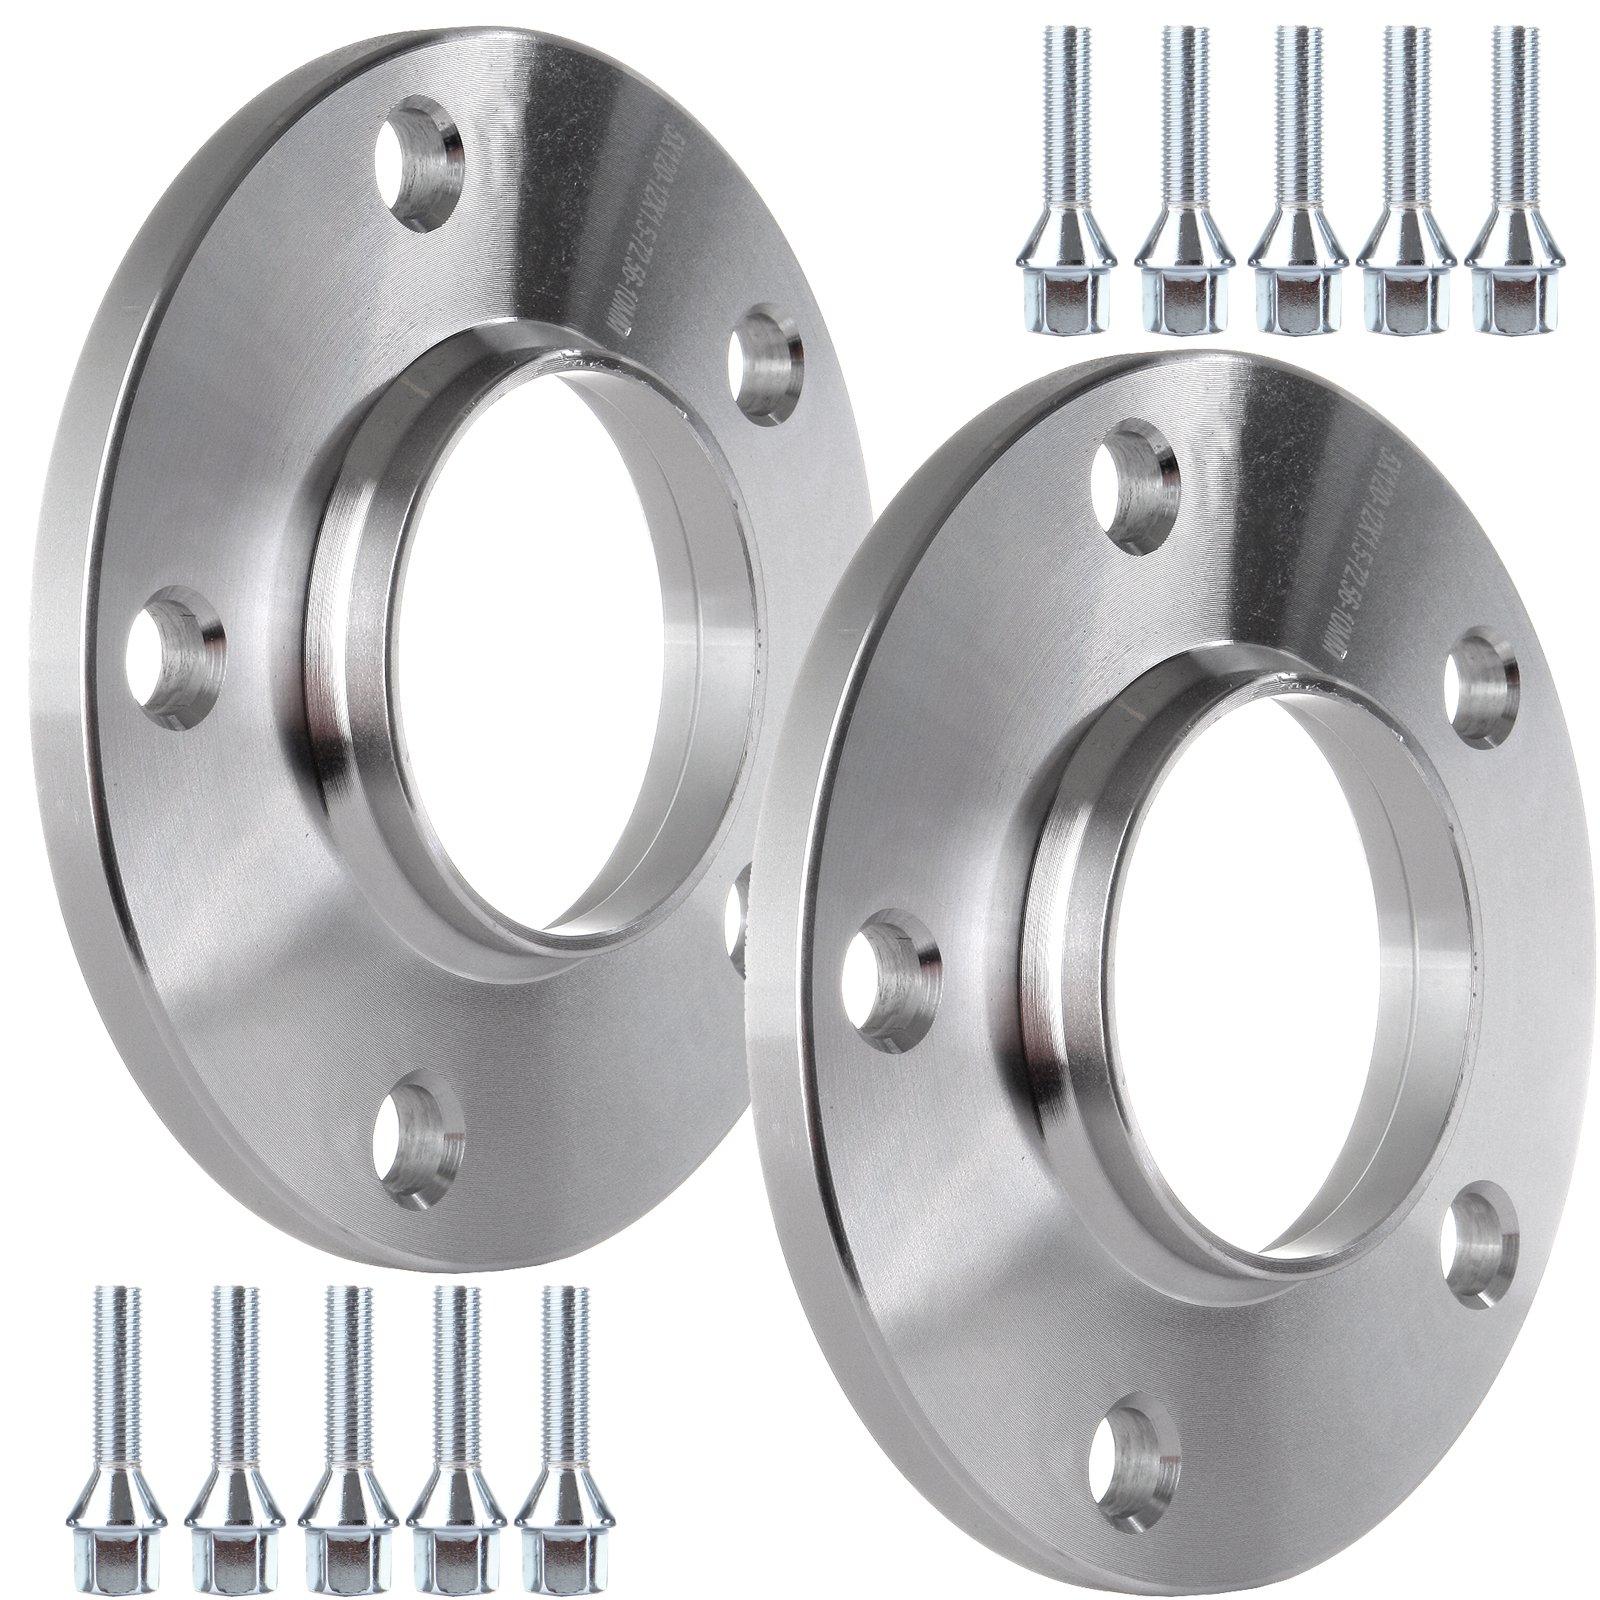 ECCPP Hubcentric Wheel Spacers 2X 10mm Thick Kit 5x120 Fits For BMW E82 E88 E36 E46 E90 E92 318i 135i 335d